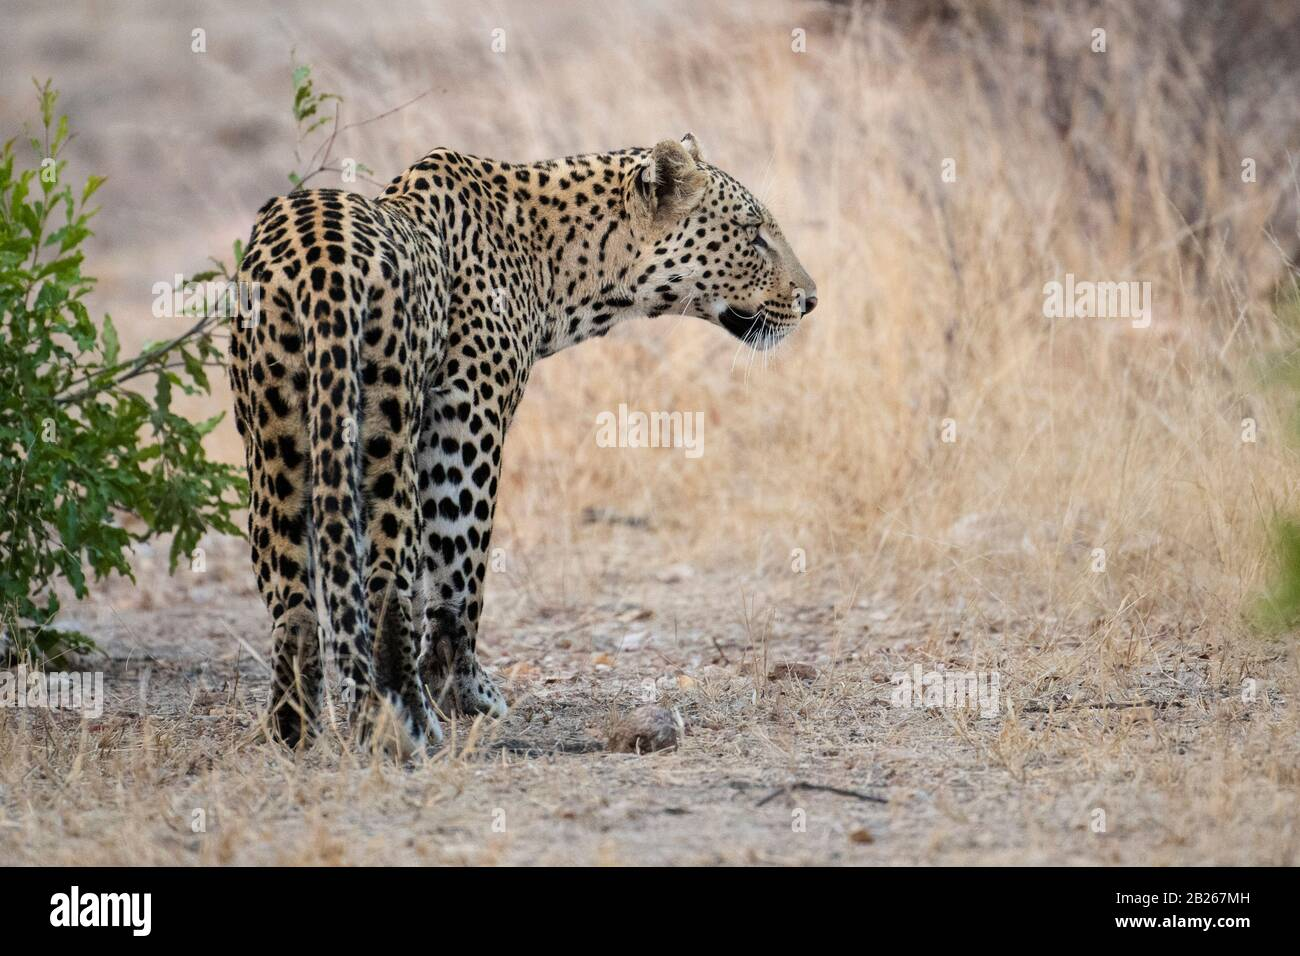 Leopardo, Panthera Pardus, Reserva Natural Privada Klaserie, Sudáfrica Foto de stock